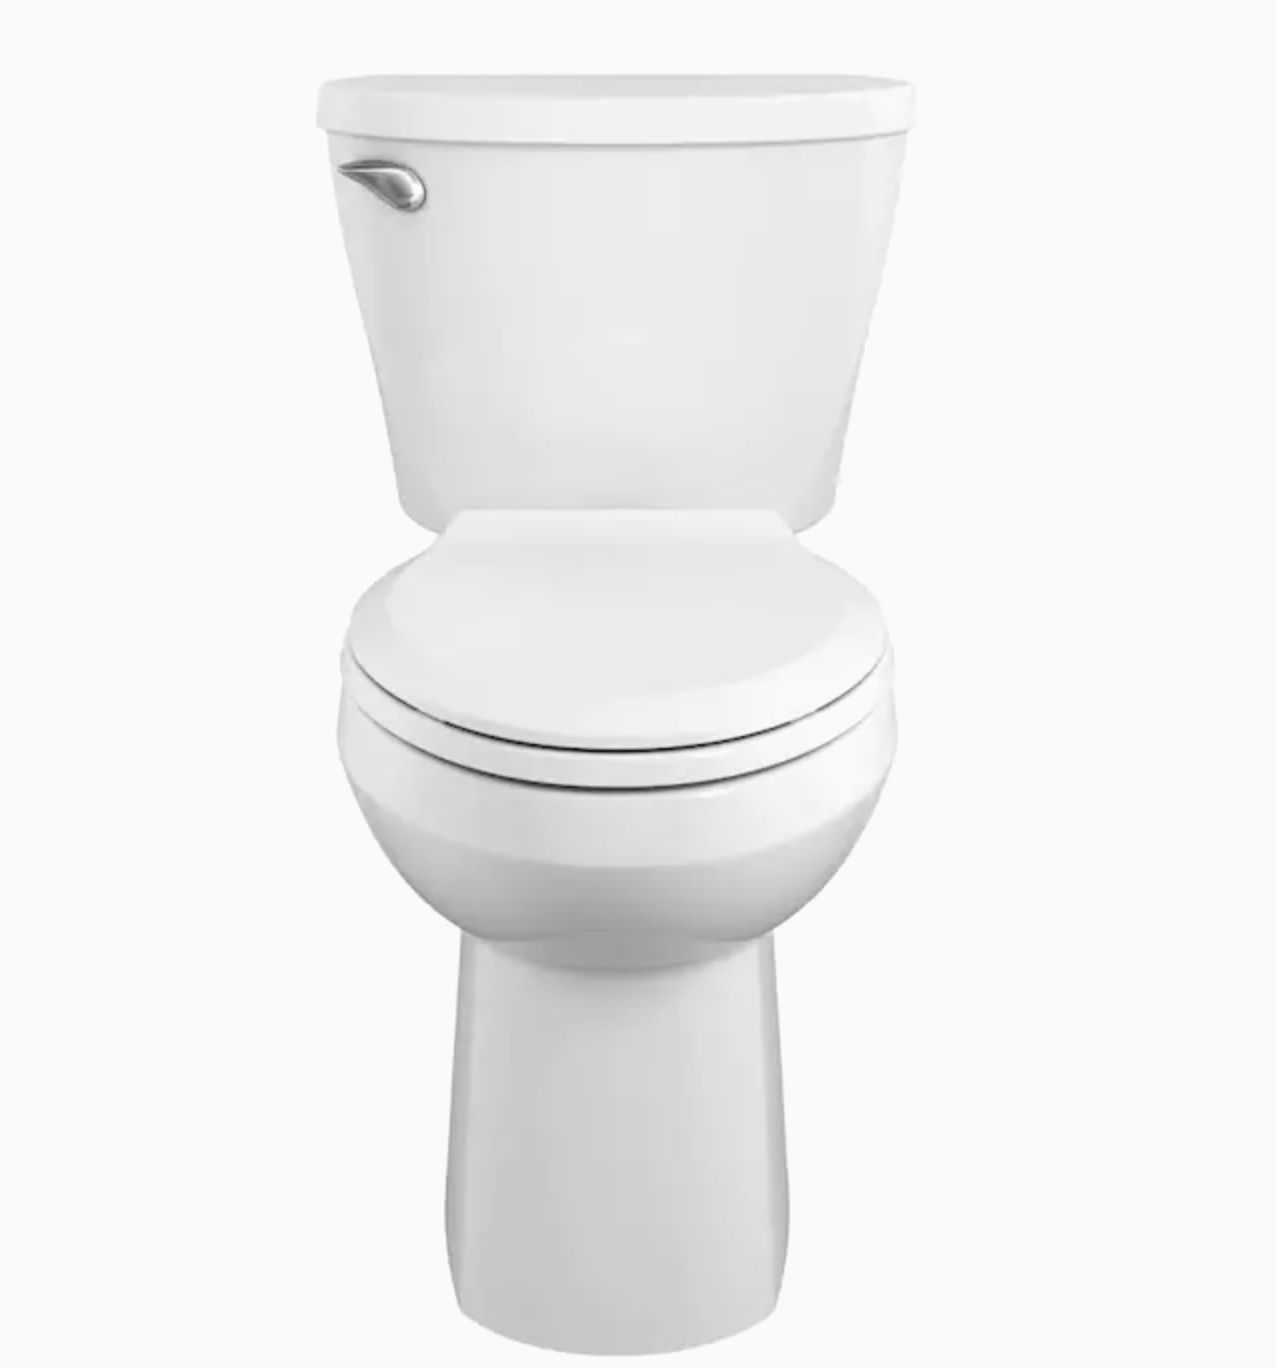 American Standard Mainstream WaterSense Elongated Toilet